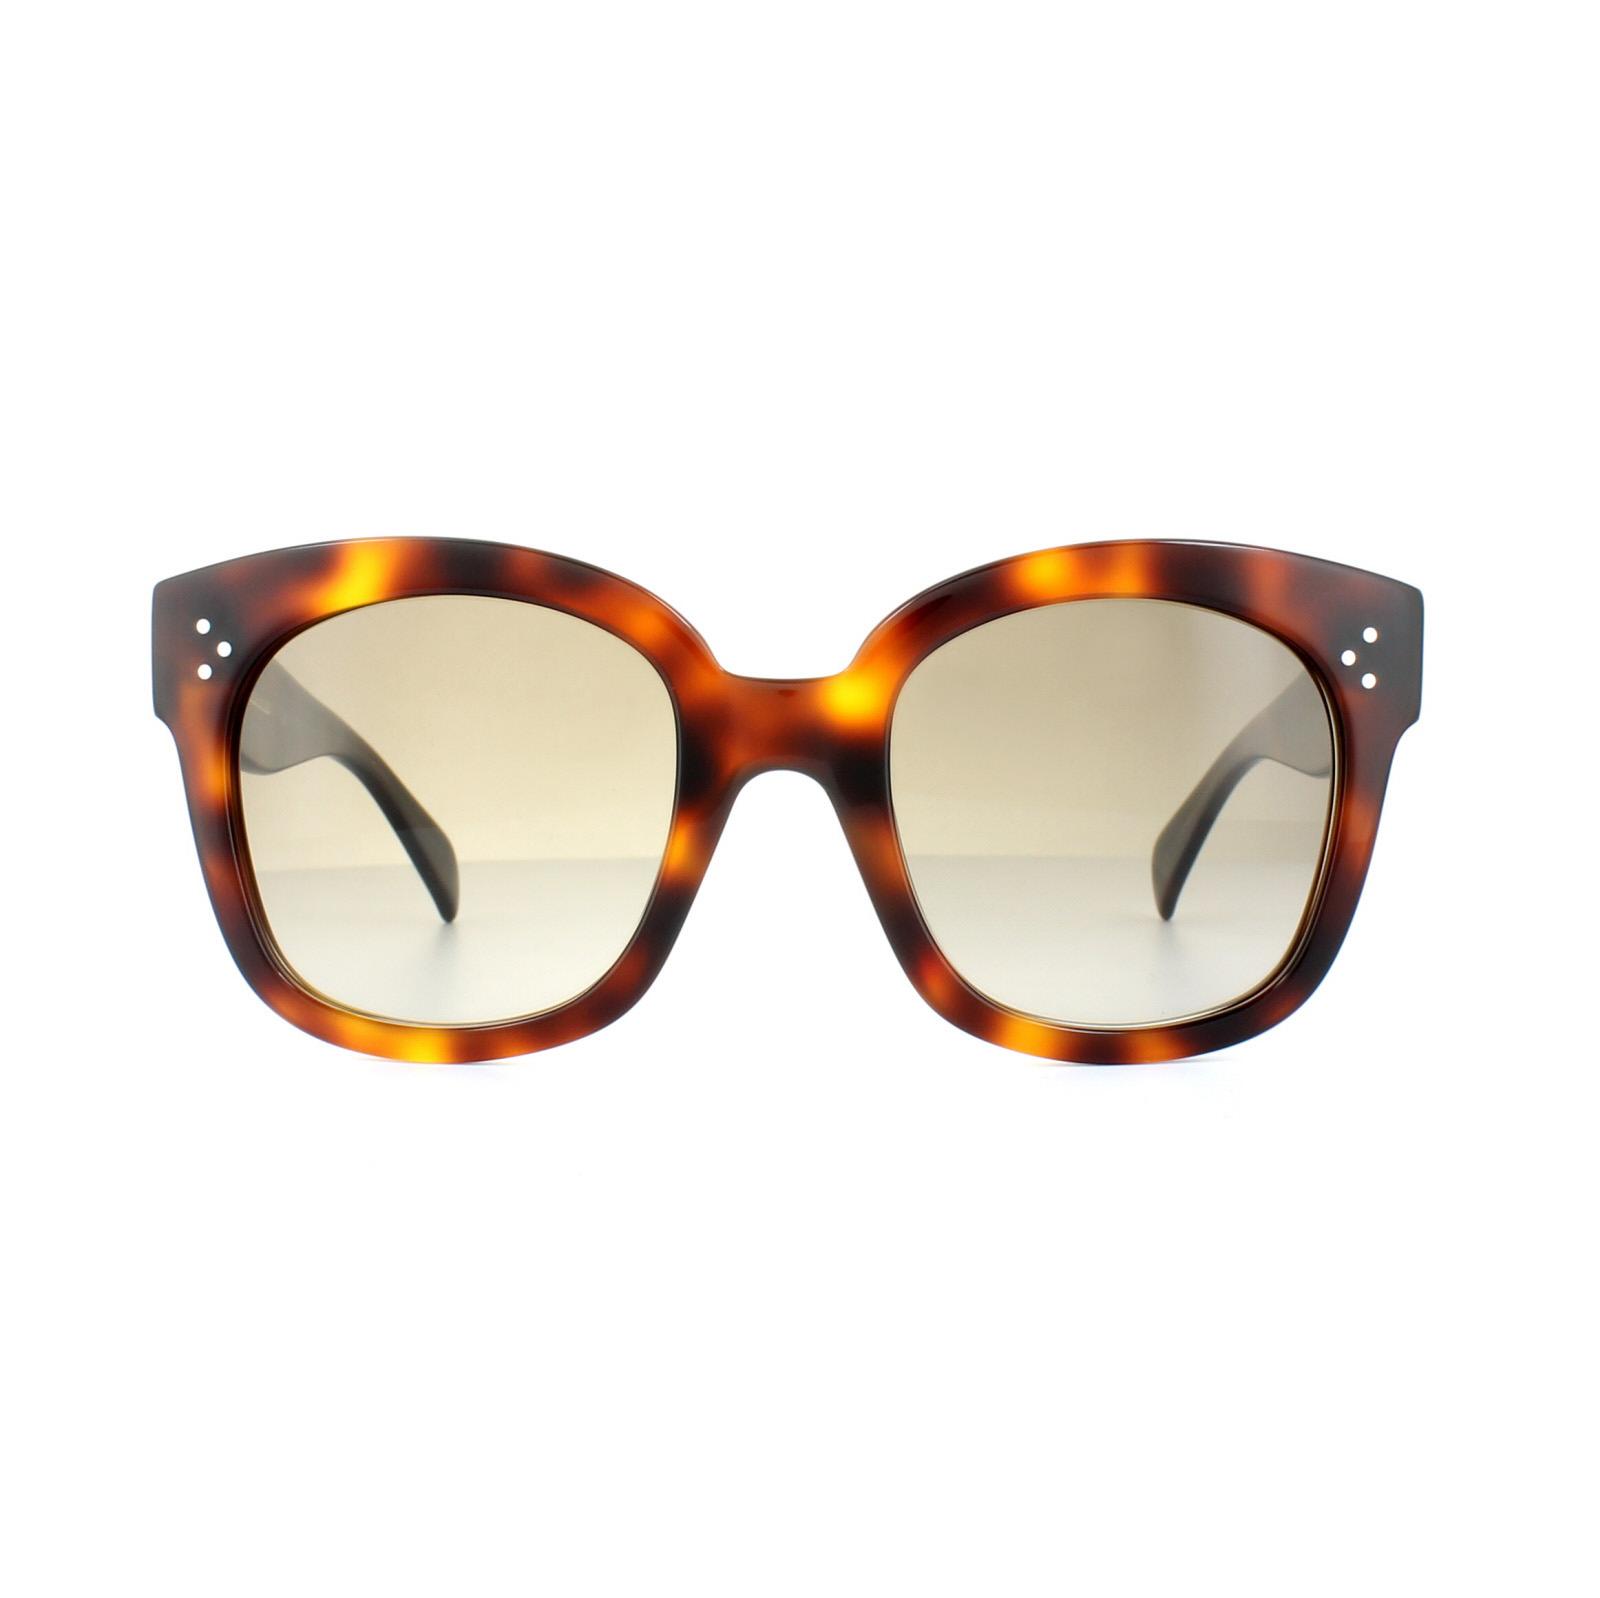 10b7f9da406 Sentinel Celine Sunglasses 41805 S New Audrey 05L HA Havana Brown Gradient